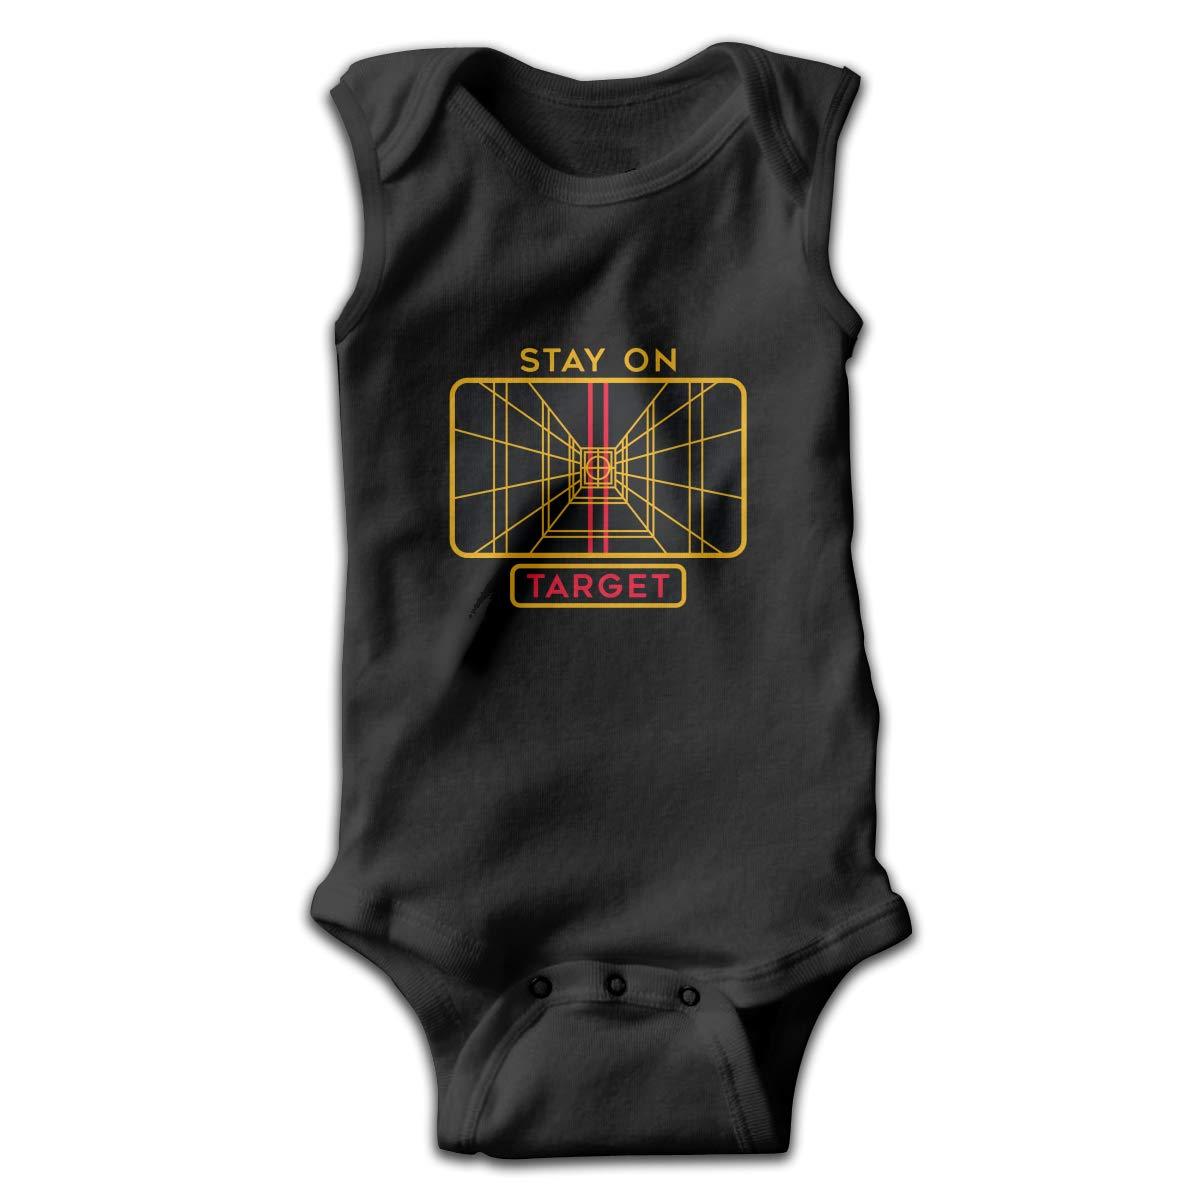 Stay On Target Smalls Baby Onesie,Infant Bodysuit Black